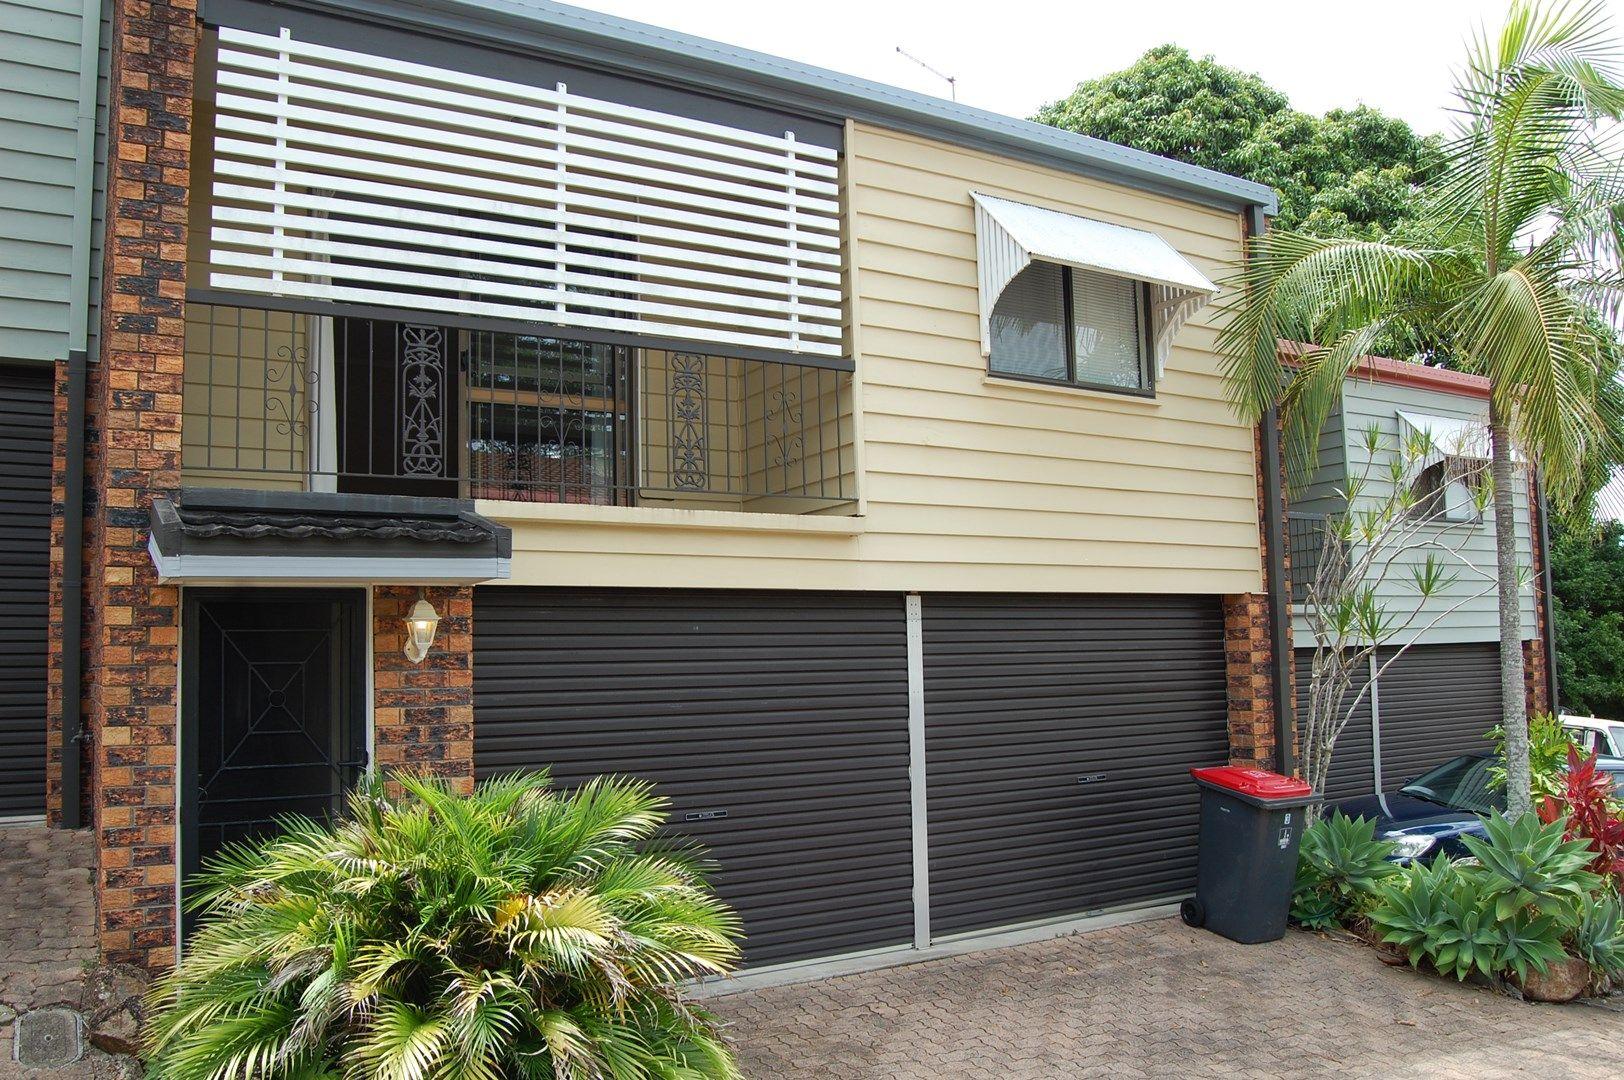 3/90 Invermore Street, Mount Gravatt QLD 4122, Image 0